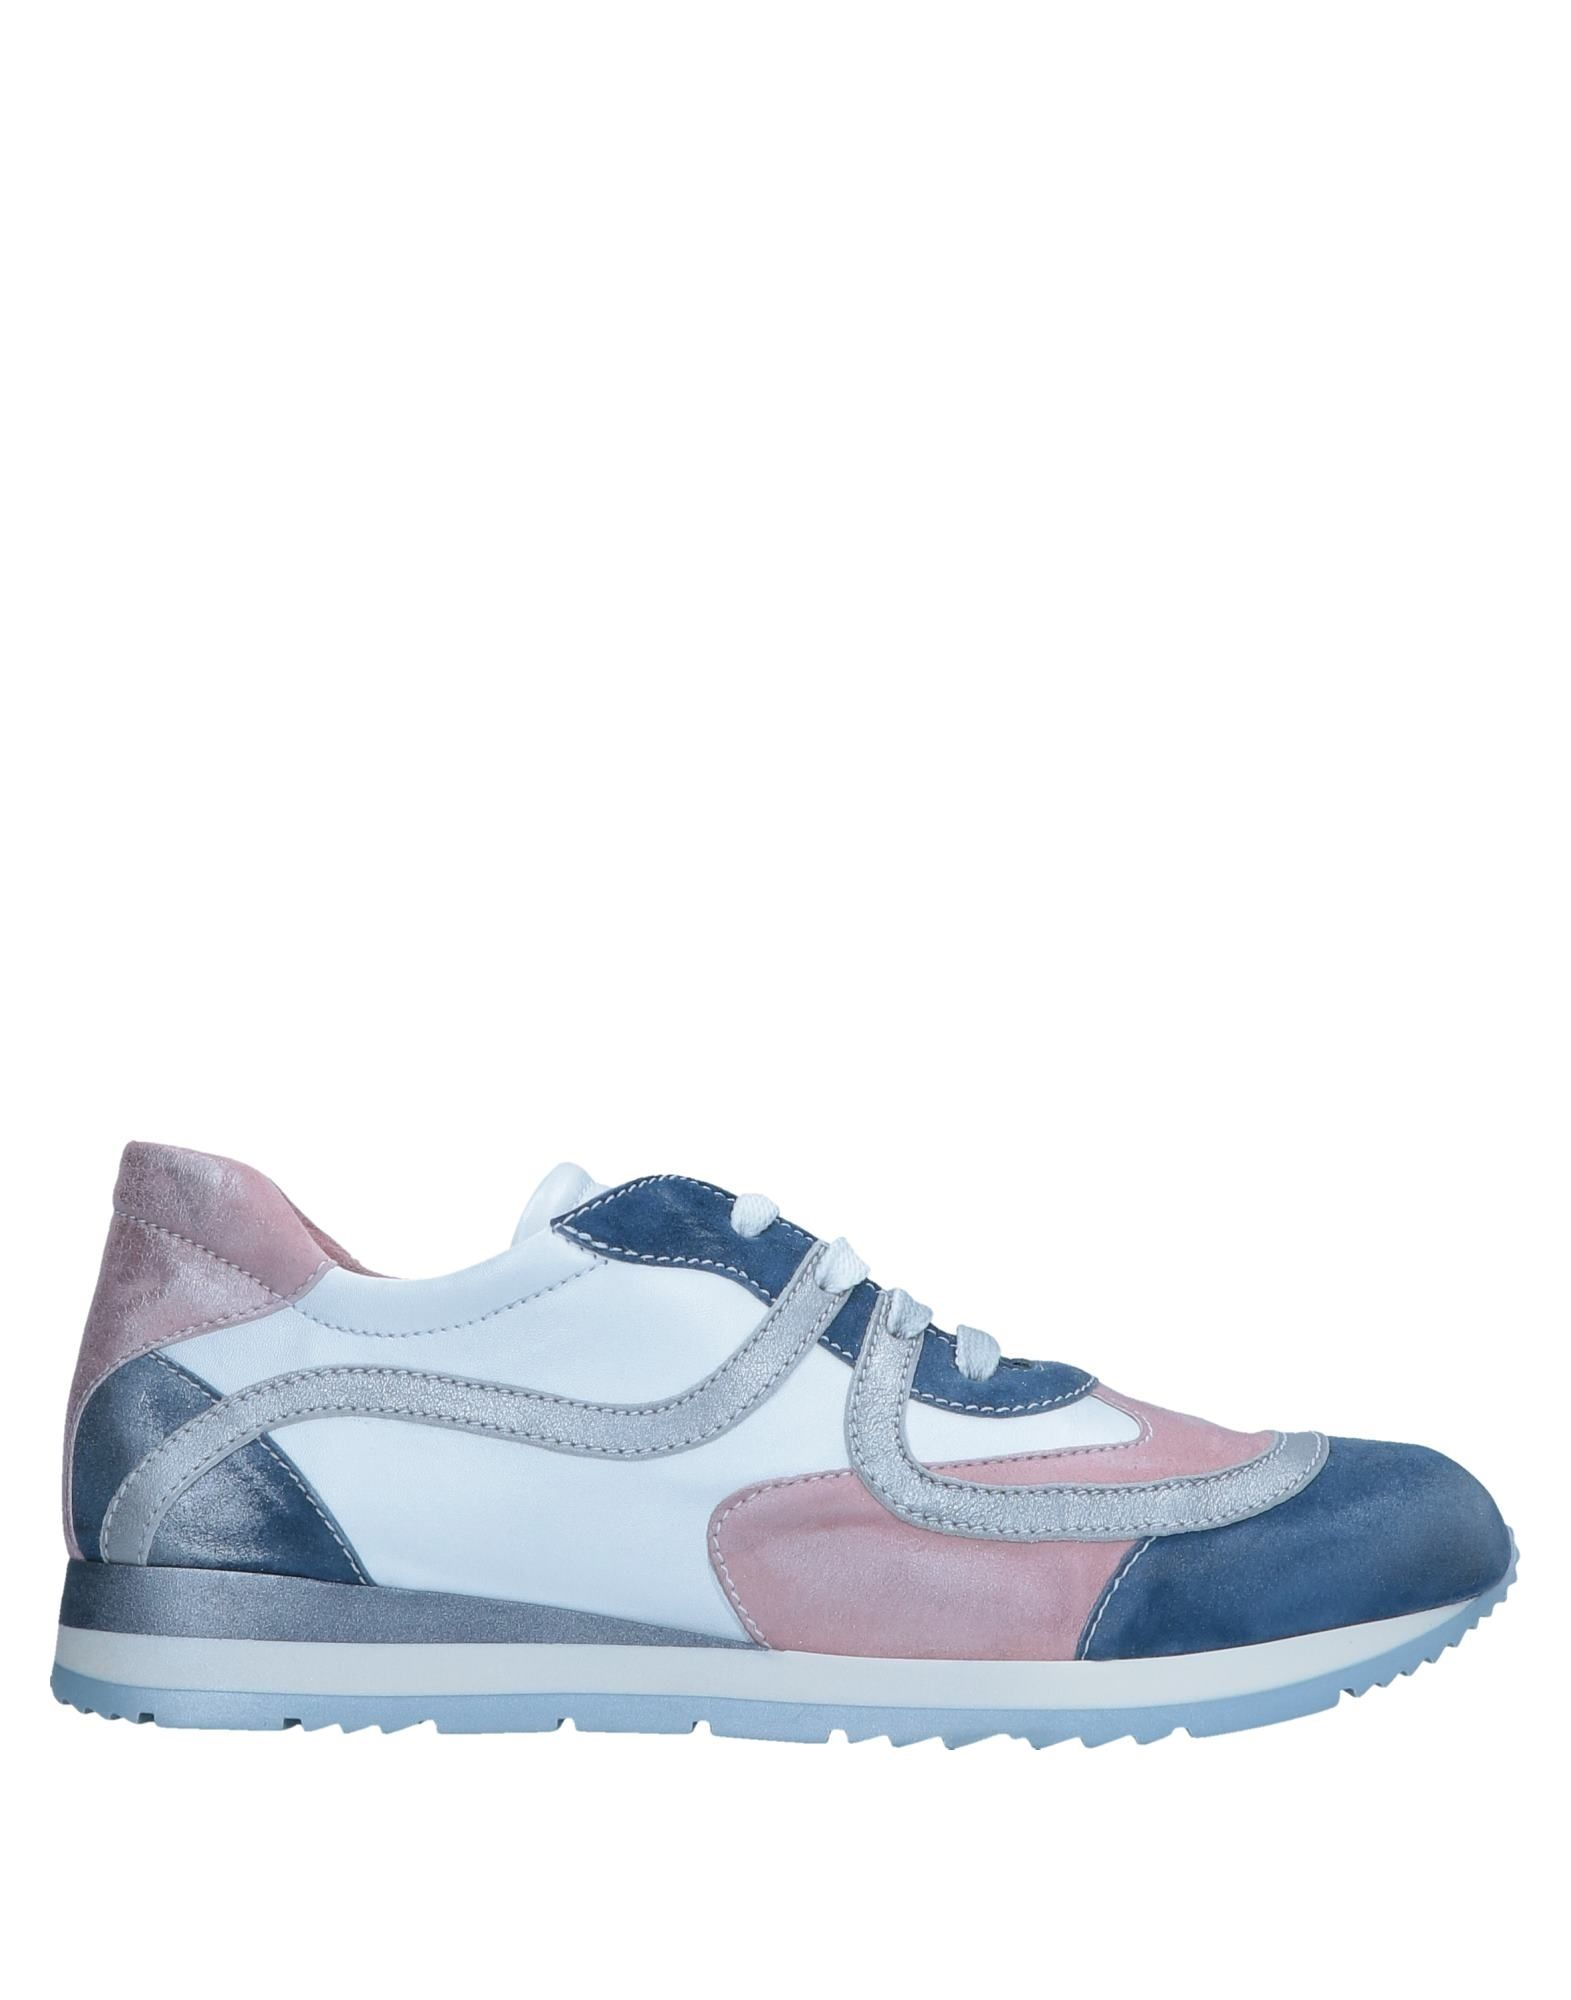 Luciano Sneakers Barachini Sneakers Luciano Damen  11548481GA  f366a5